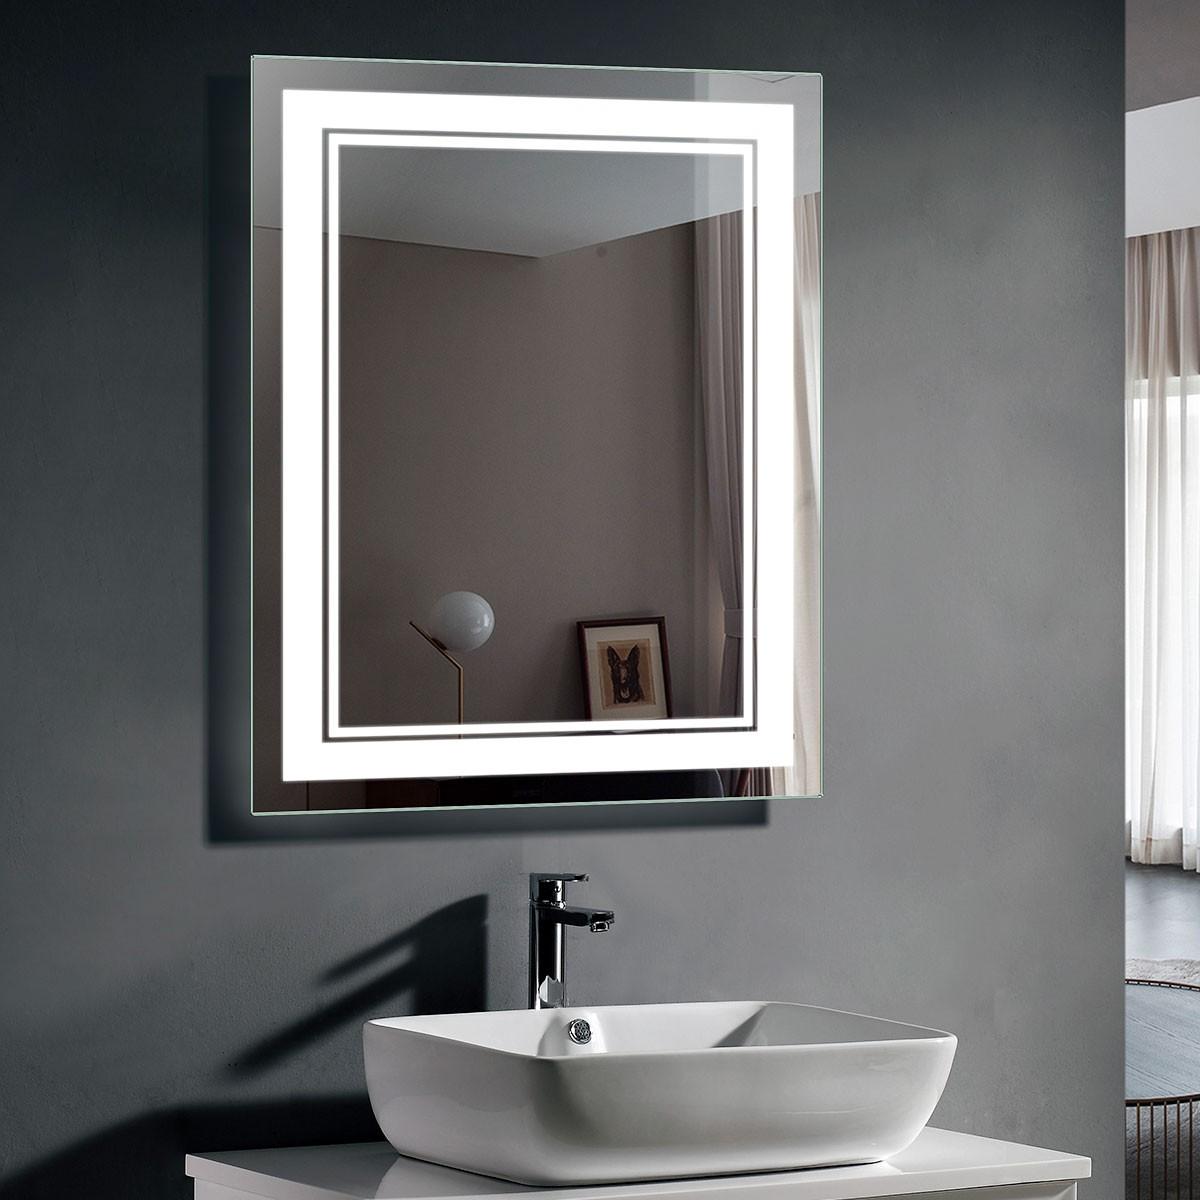 28 x 36 In LED Bathroom Mirror with Infrared Sensor (DK-OD-CK160-IG)